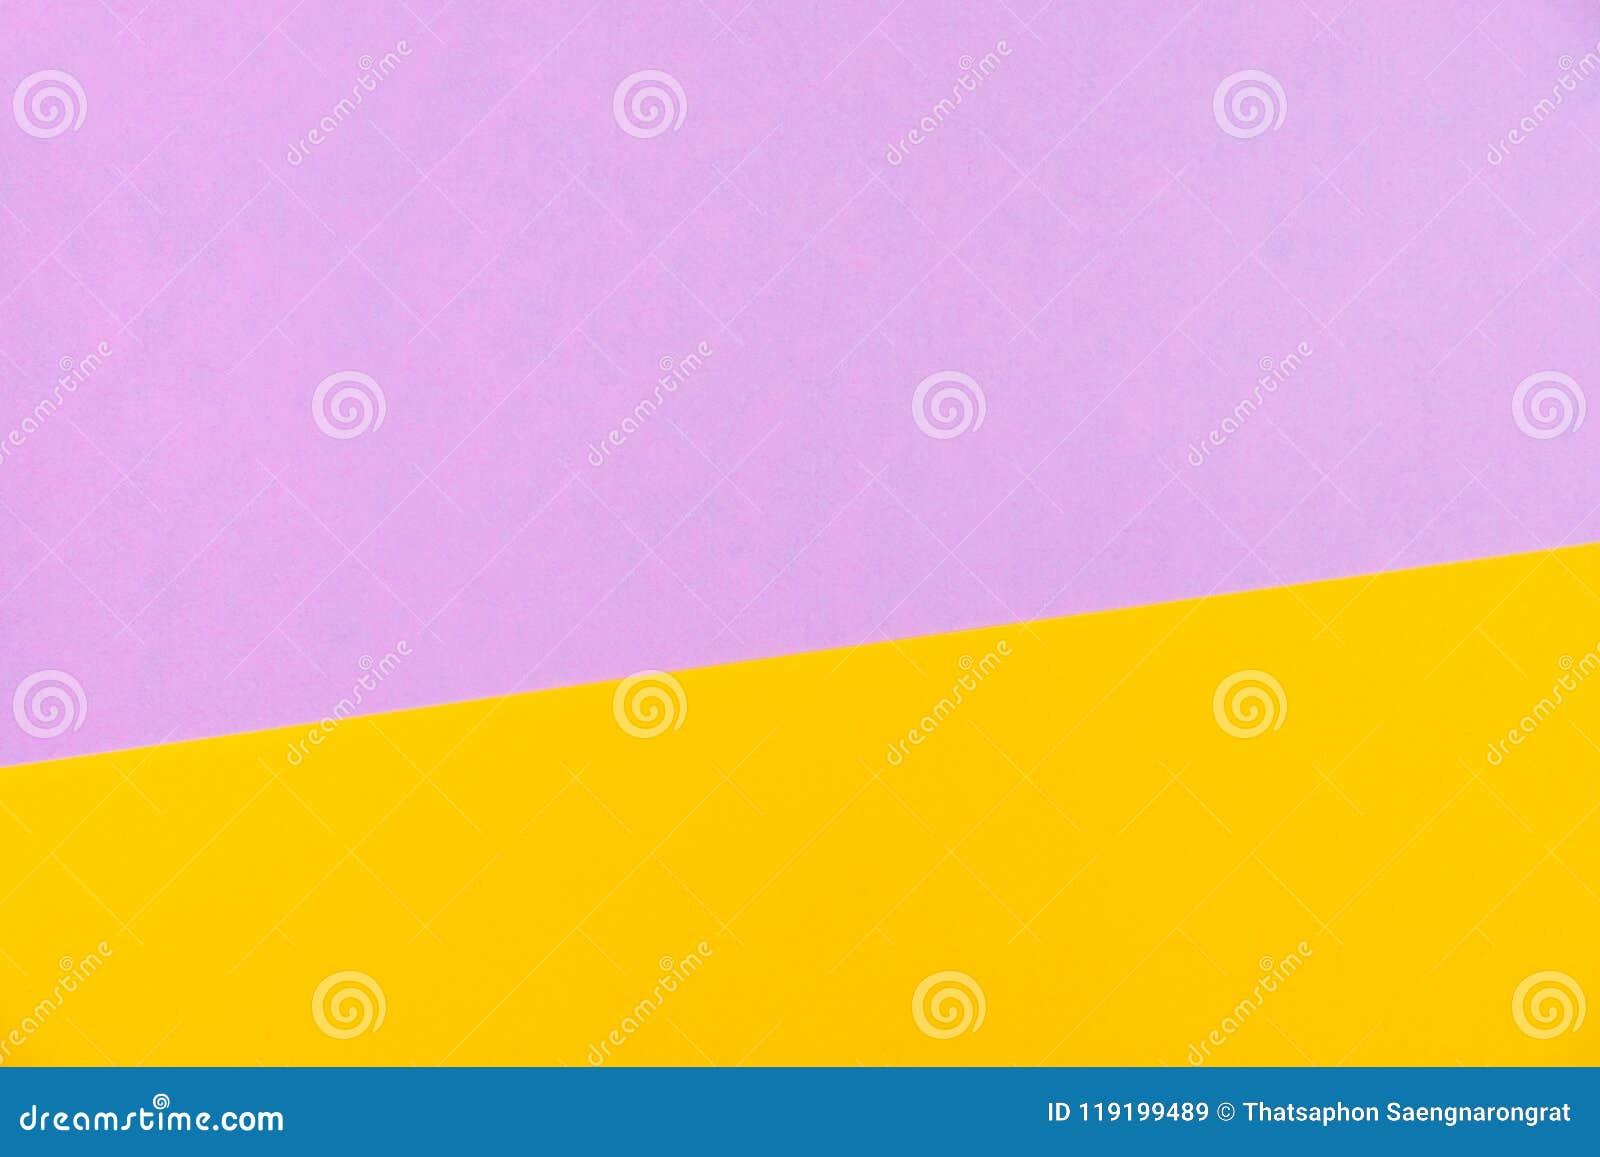 De pastelkleur kleurde document vlakte legt hoogste mening, achtergrondtextuur, roze